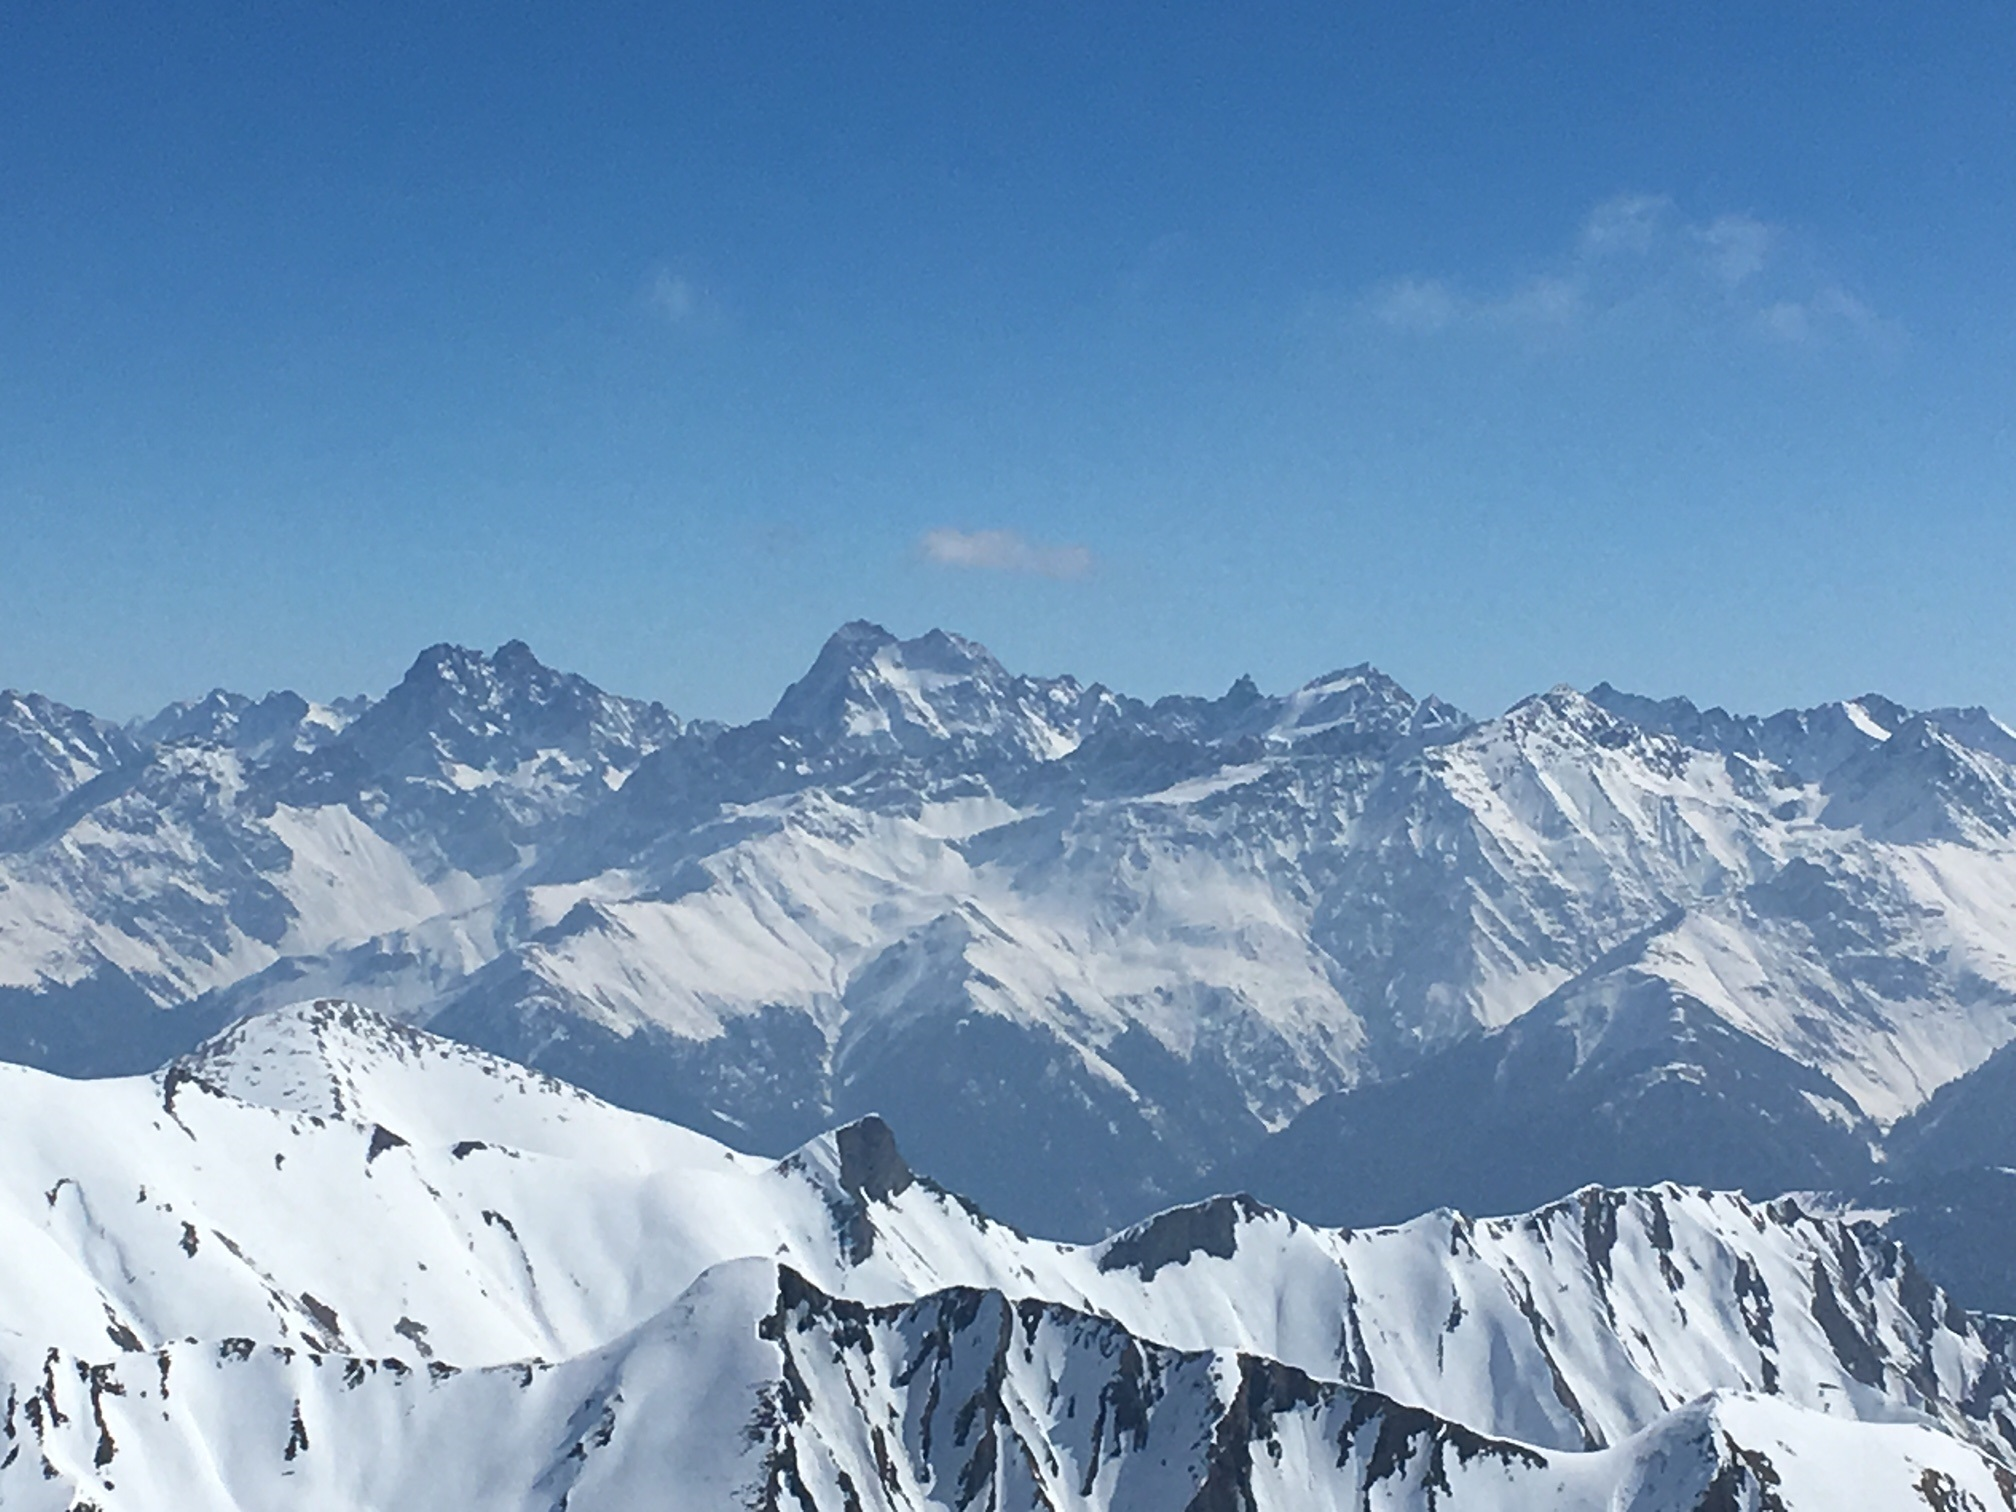 Serfaus Tirol, Serfaus Österreich, Bergpanorama Serfaus, Serfaus Bergpanorama, tolle Aussicht Serfaus, Lifestyle Blog Lieblingsstil, Lifestyleblog Lieblingsstil